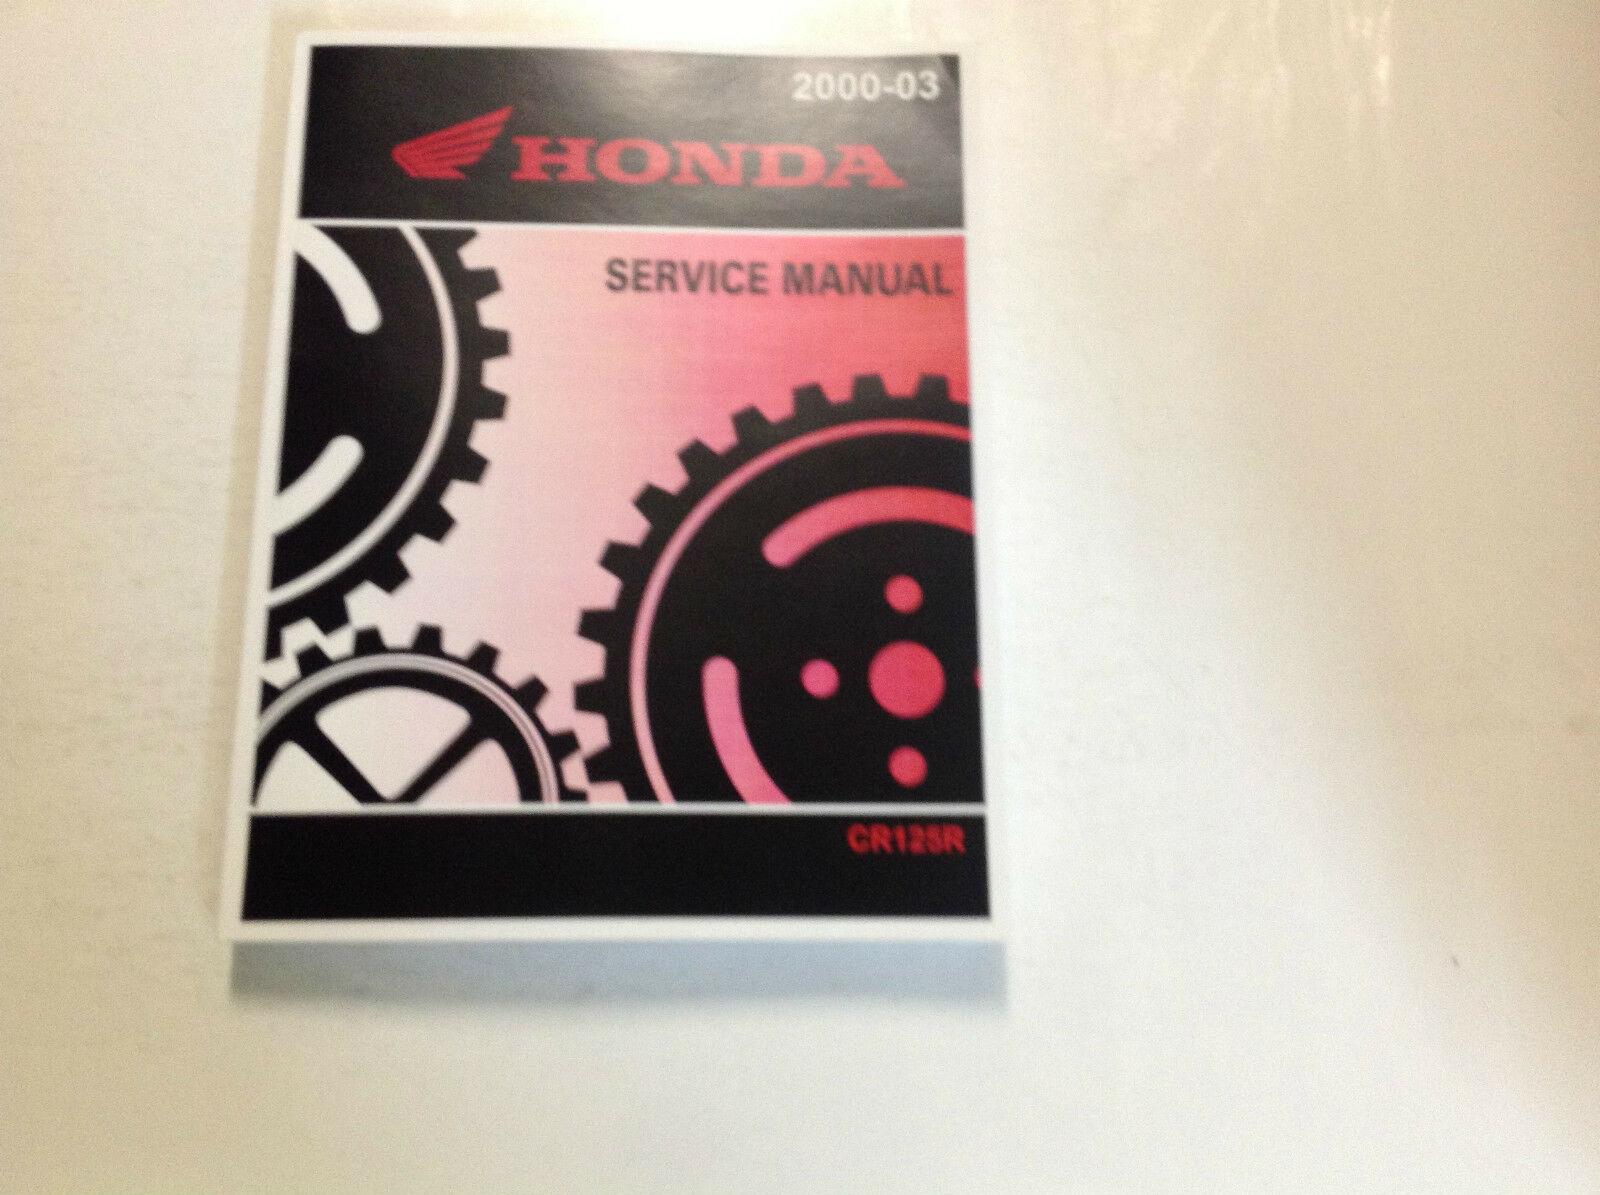 2000 2001 2002 2003 honda cr125r Service Repair Manual FACTORY OEM NEW - $102.98